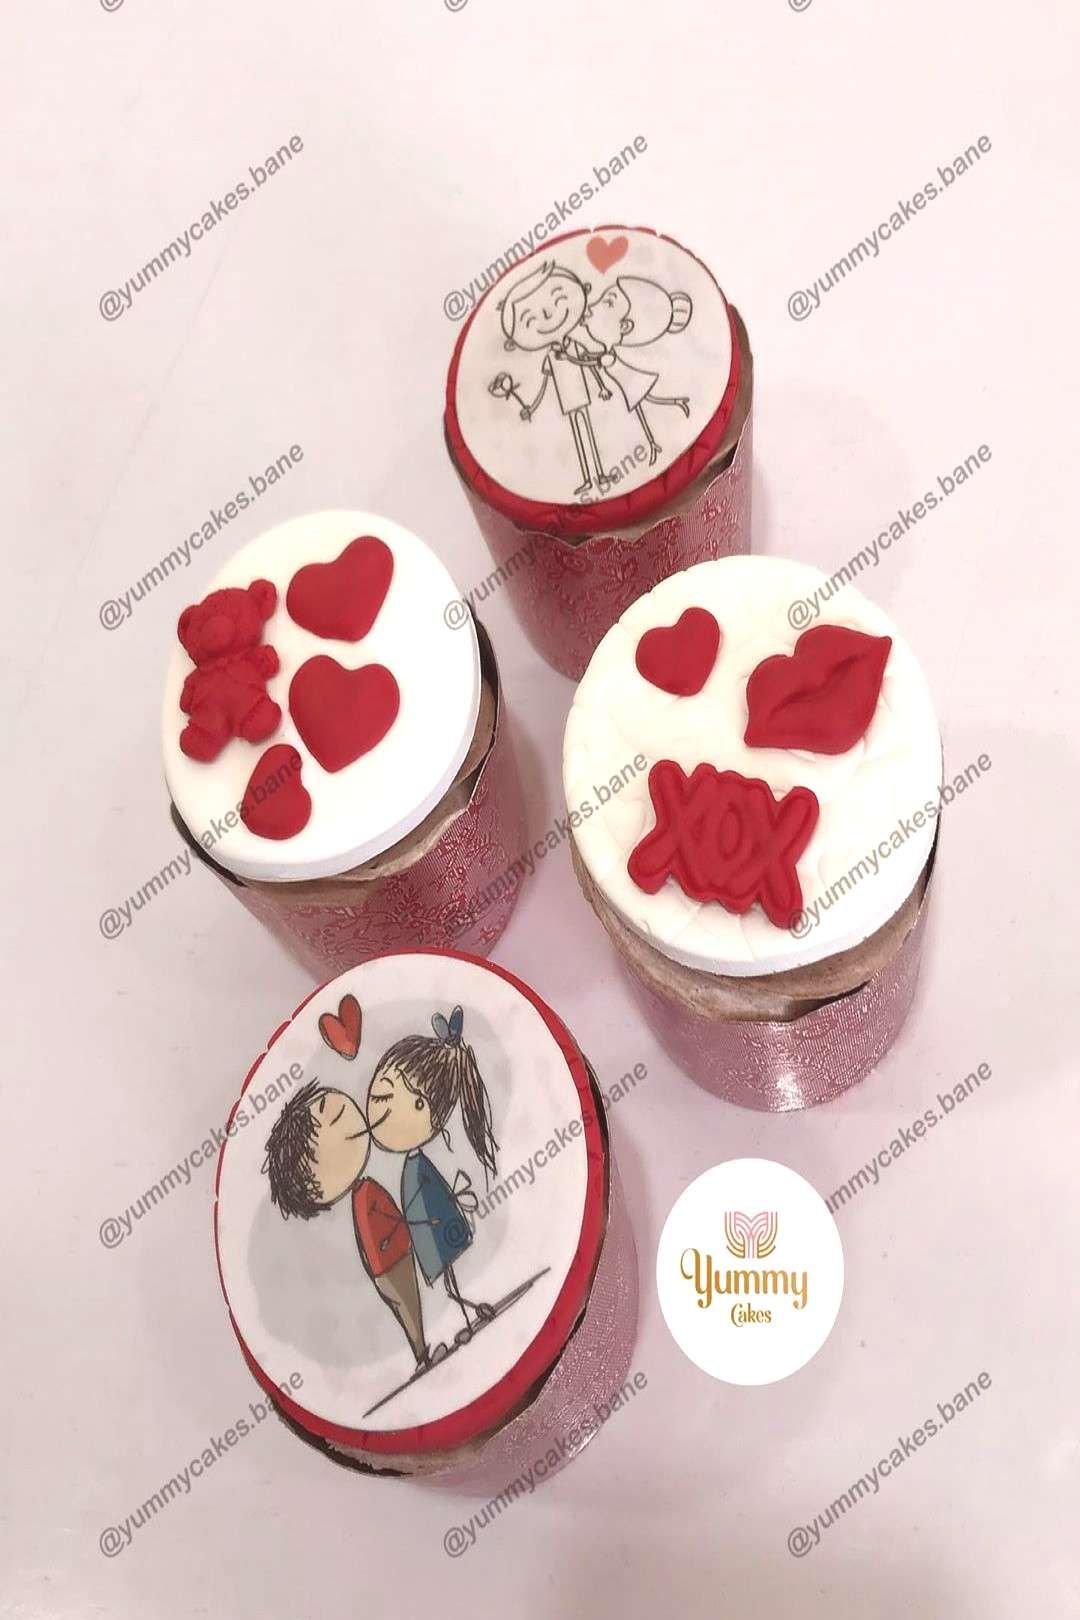 #valentinecupcakes #bane #کاپ_کیک_ولنتاین